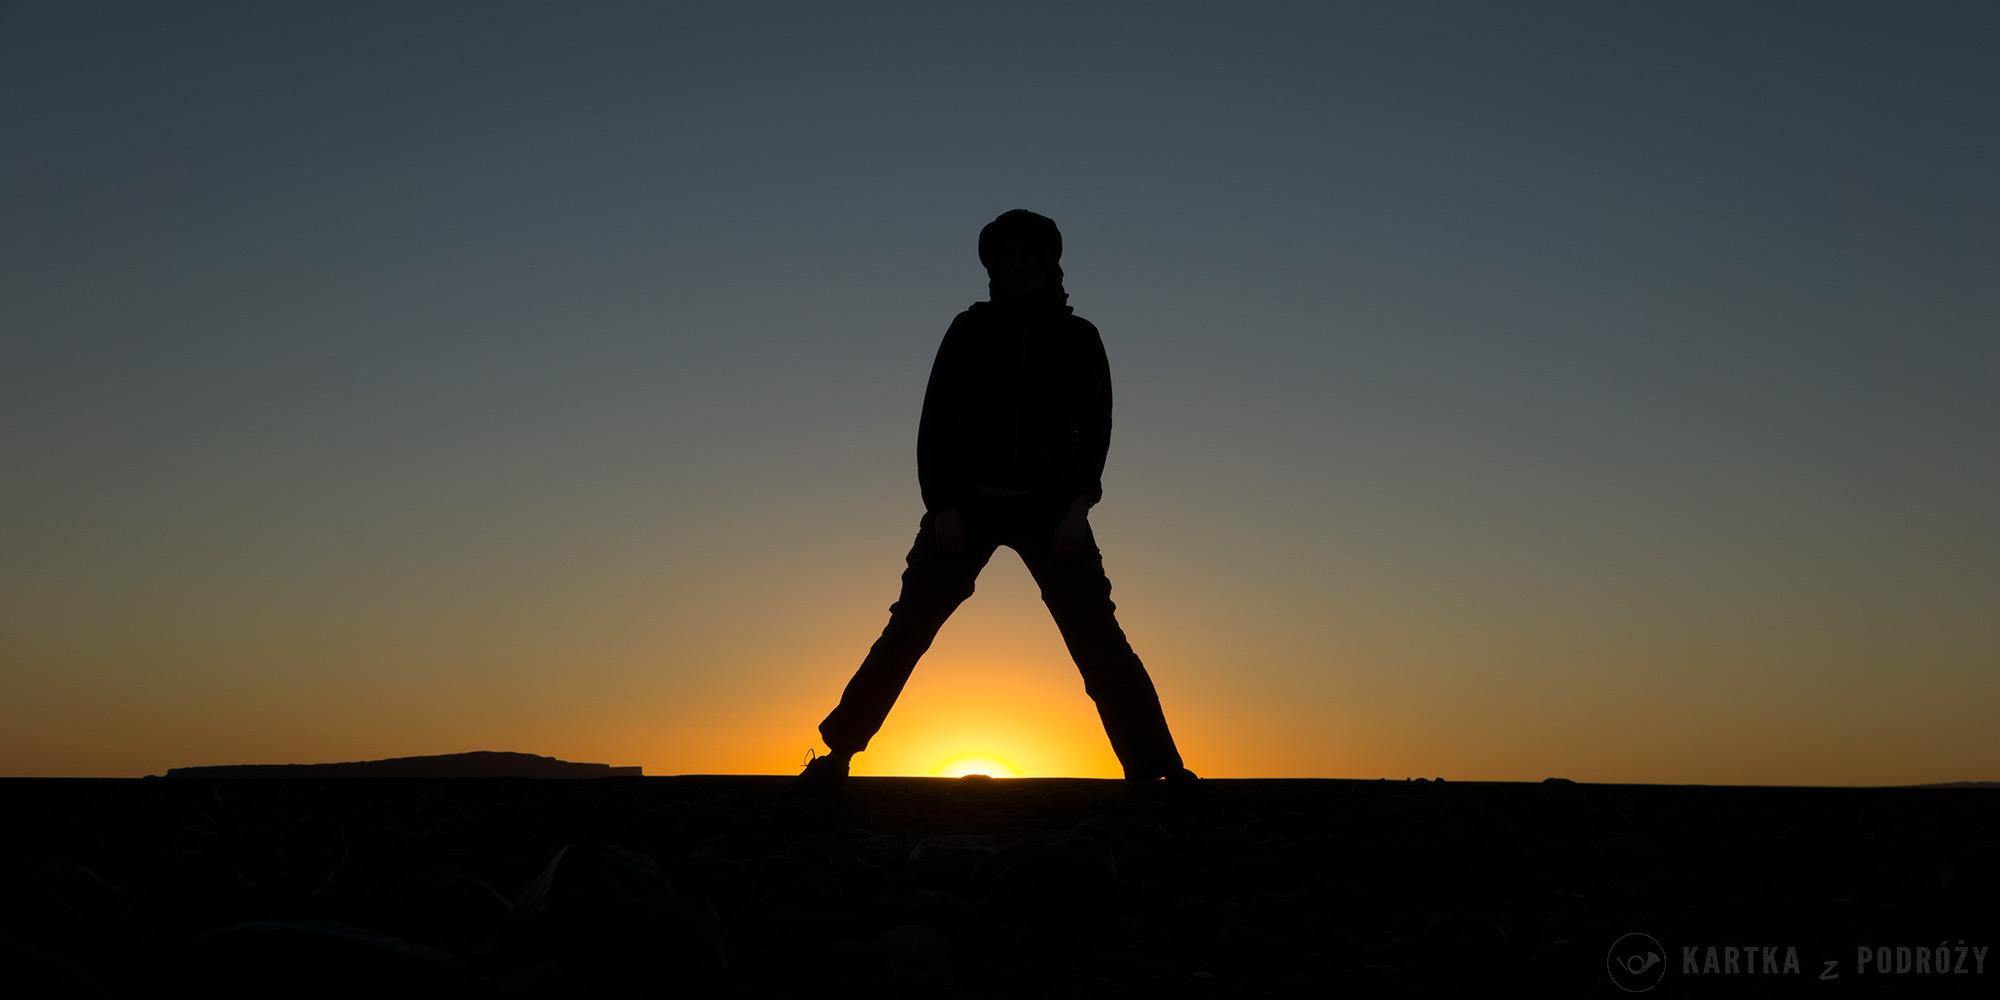 7. Czarny - Niebo nad Saharą